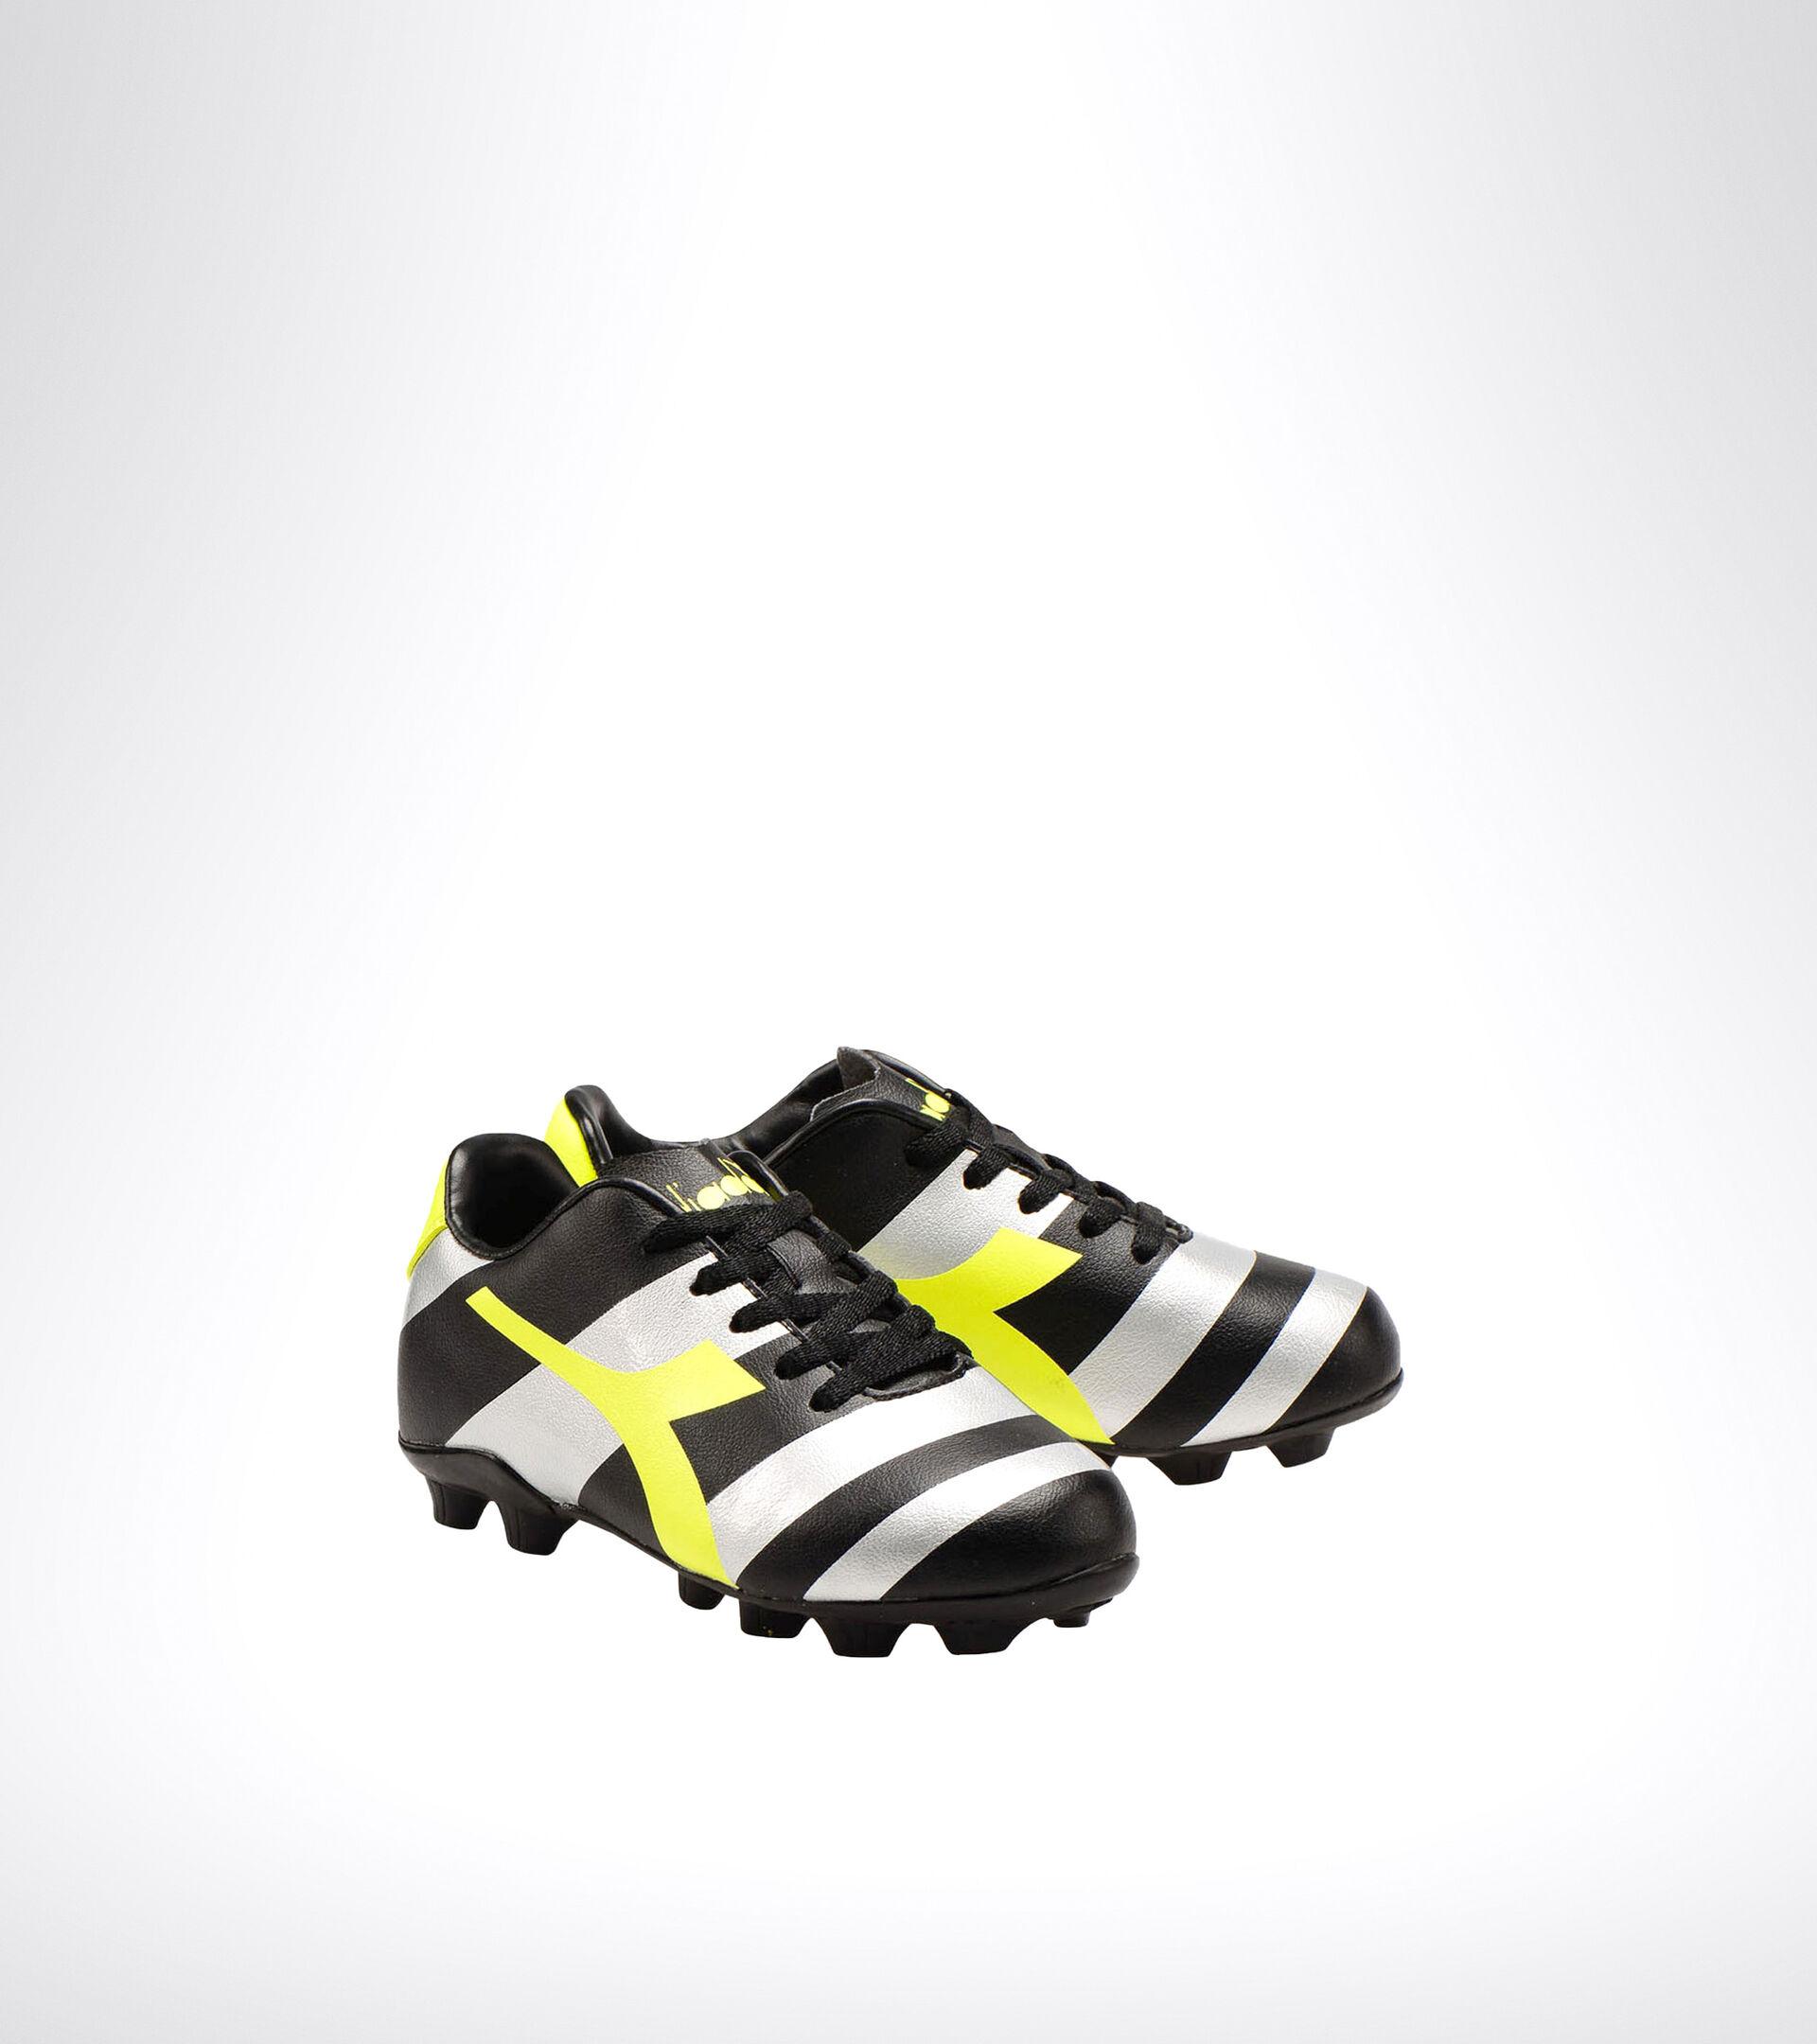 Footwear Sport BAMBINO RAPTOR R MD JR NERO/ARGENTO/GIALLO FL DD Diadora